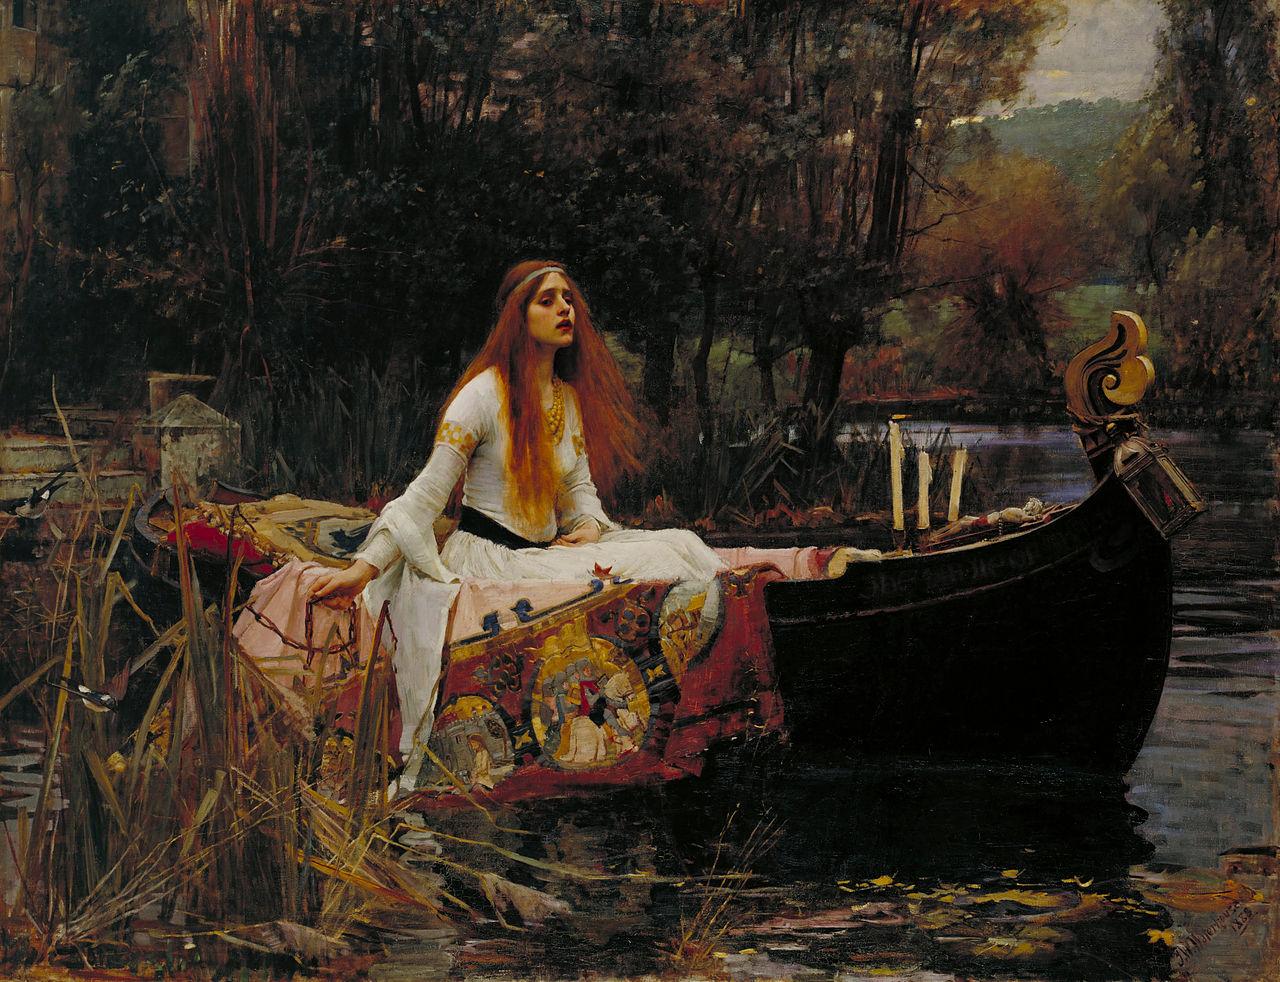 1280px-John_William_Waterhouse_-_The_Lady_of_Shalott_-_Google_Art_Project.jpg